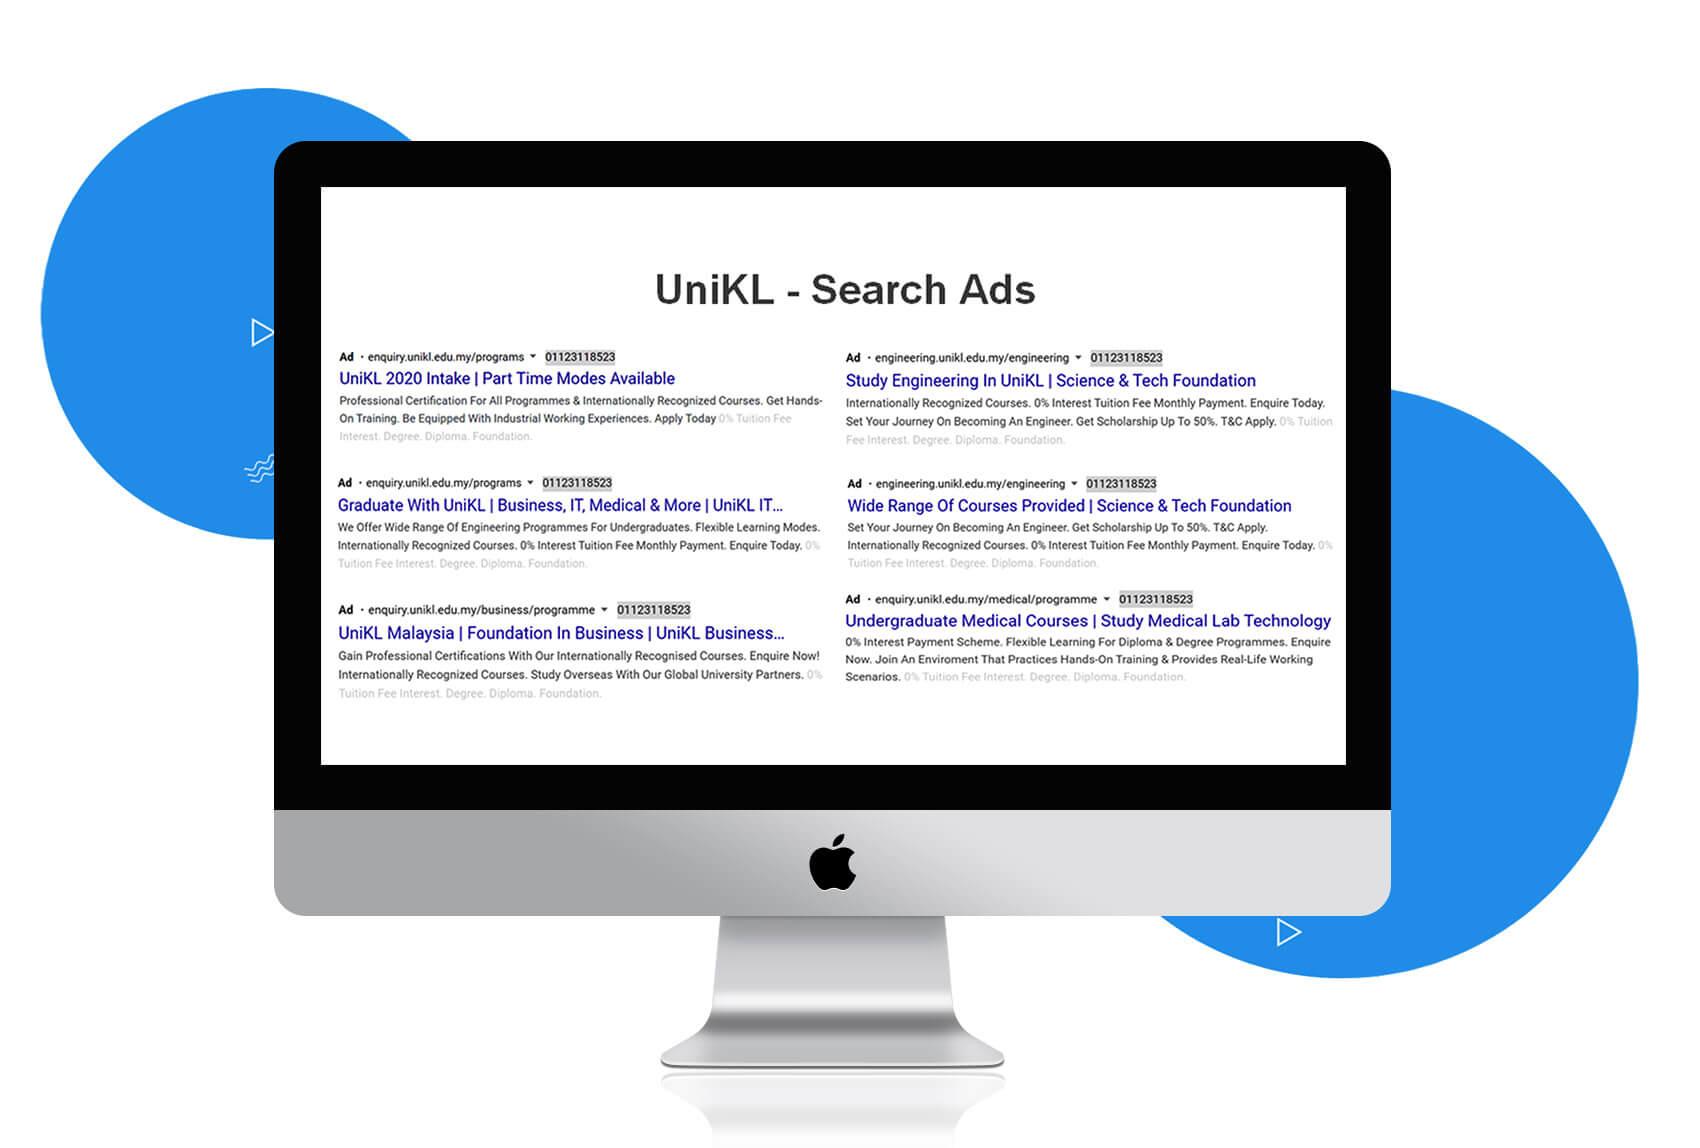 unikl-google-search-ads-text-2